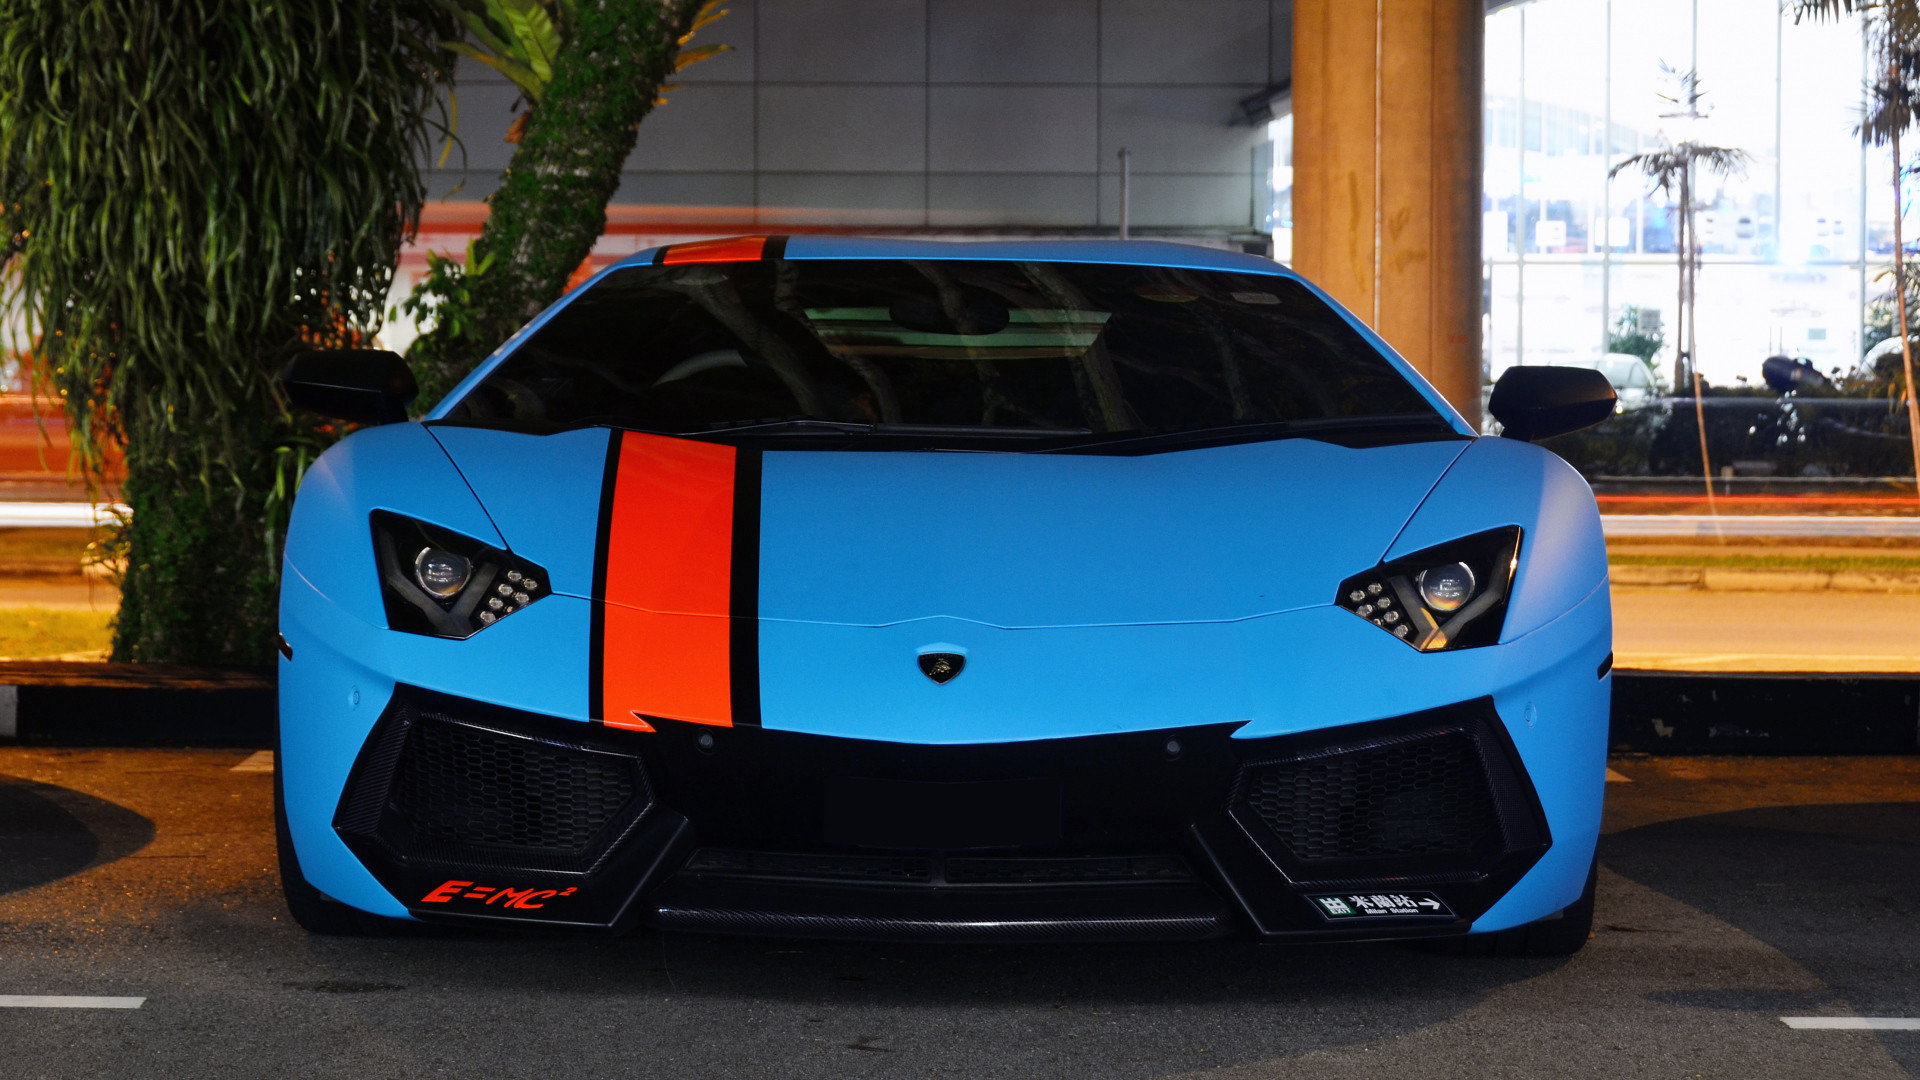 Fast And Furious Cars Hd Wallpapers Wallpaper Full Hd 1080p Lamborghini New 2018 79 Images